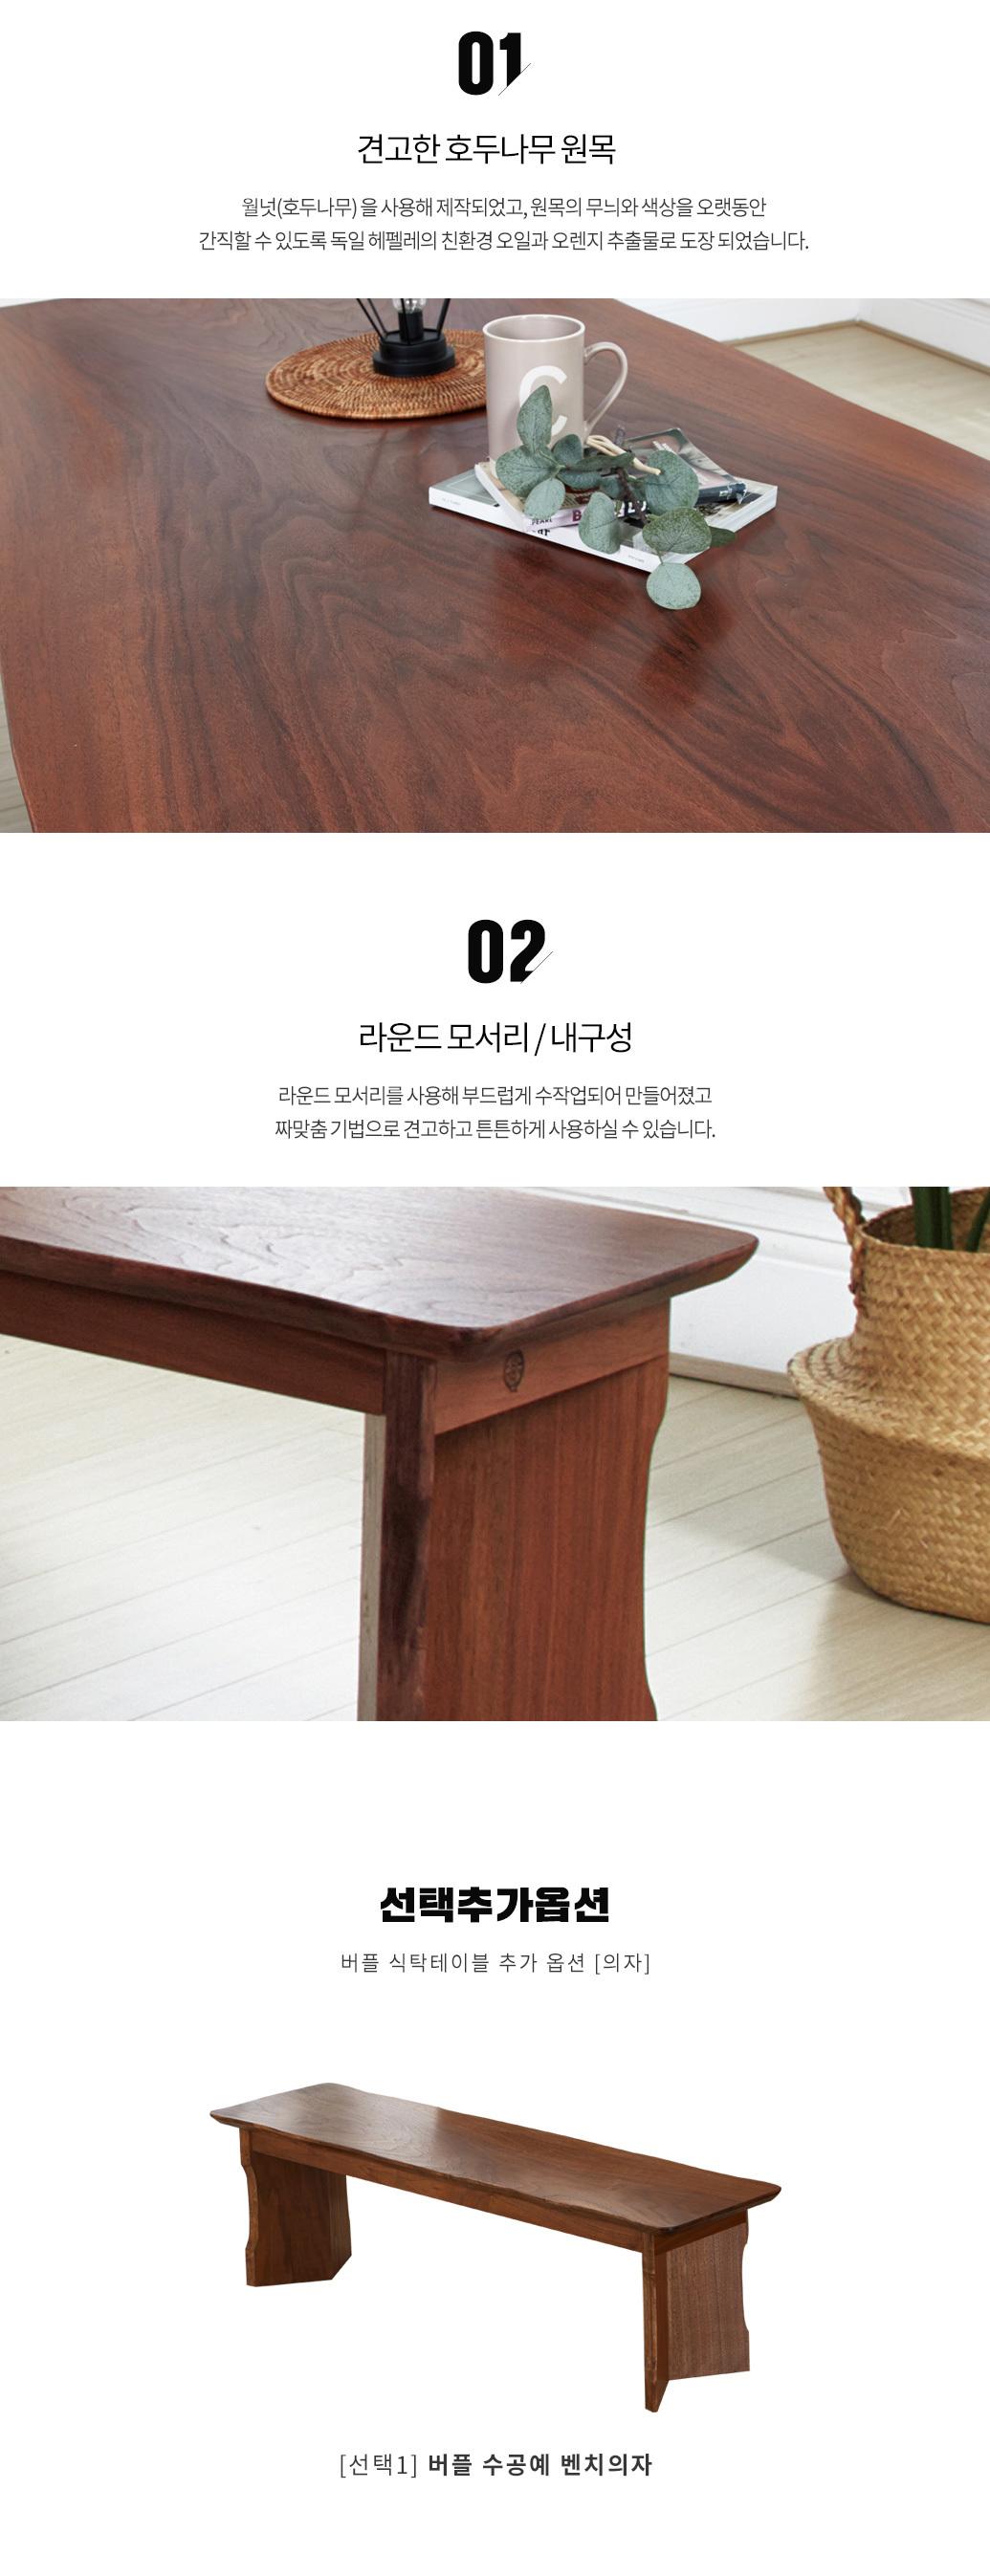 Buffle_table_03.jpg